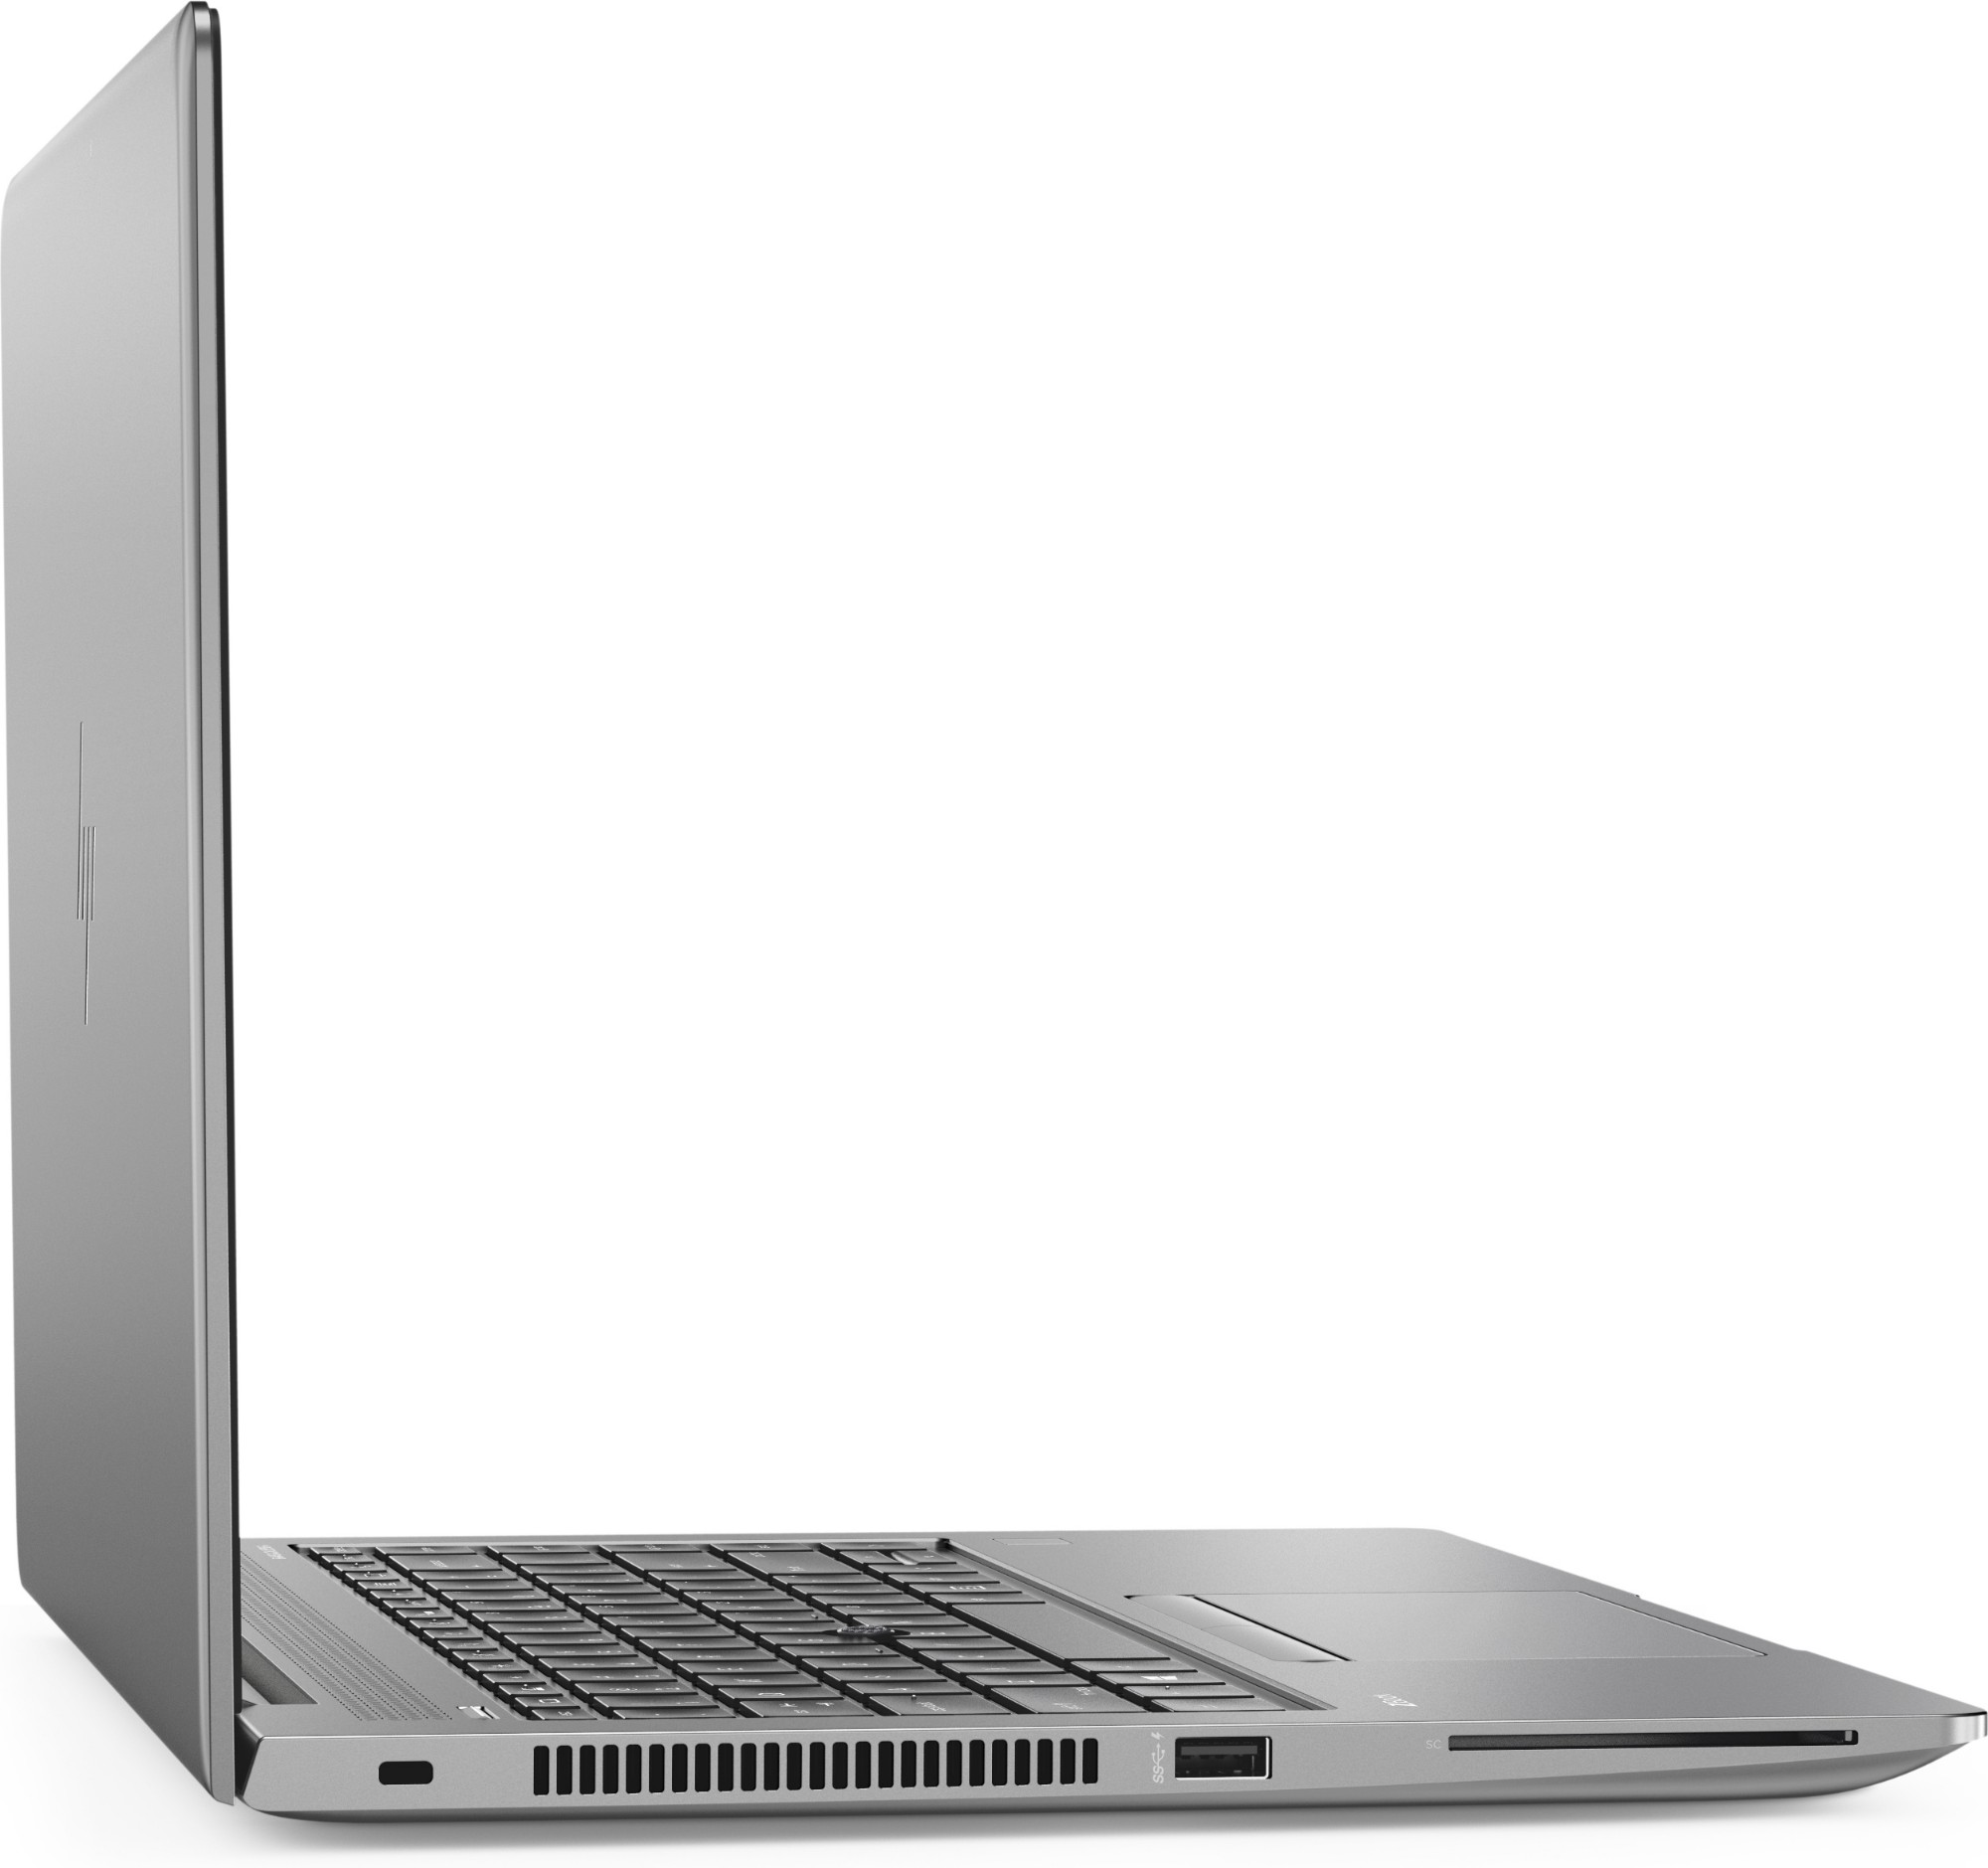 HP ZBook 14U G5 Silver Mobile workstation 35 6 cm (14